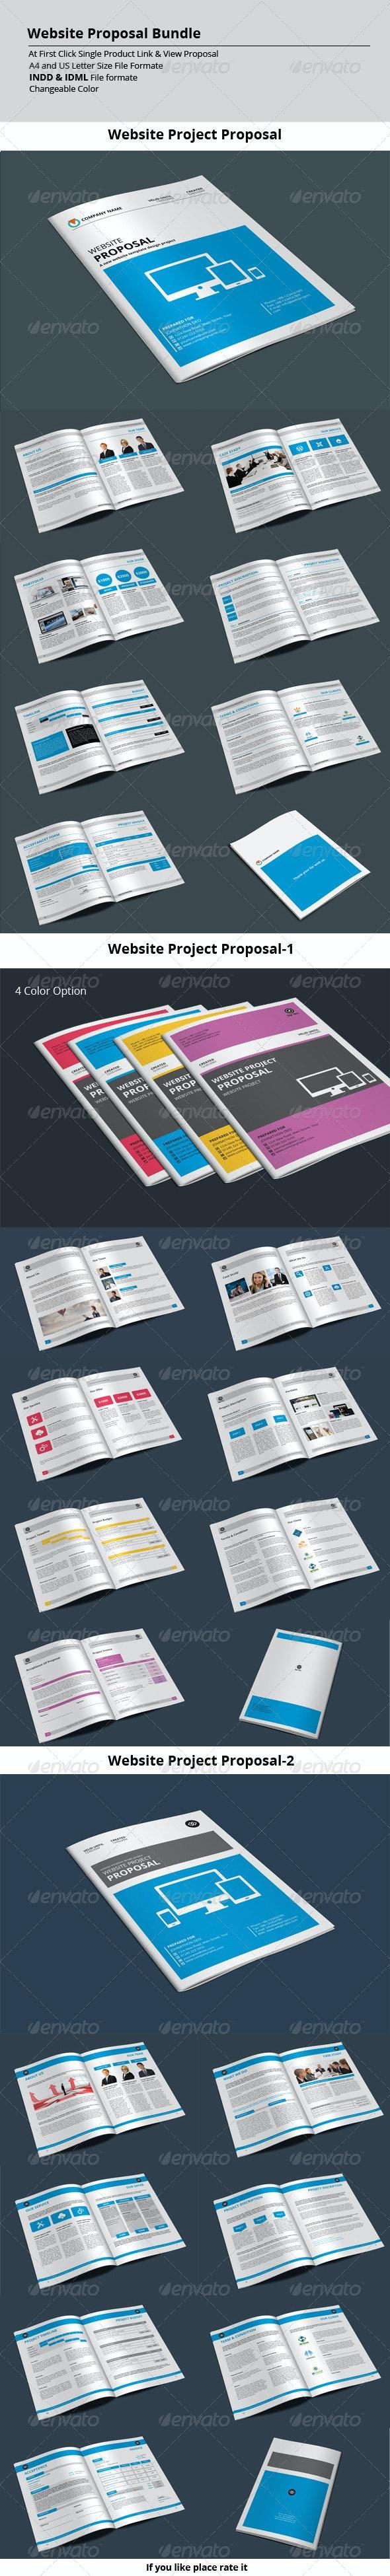 Website Proposal Bundle - Proposals & Invoices Stationery